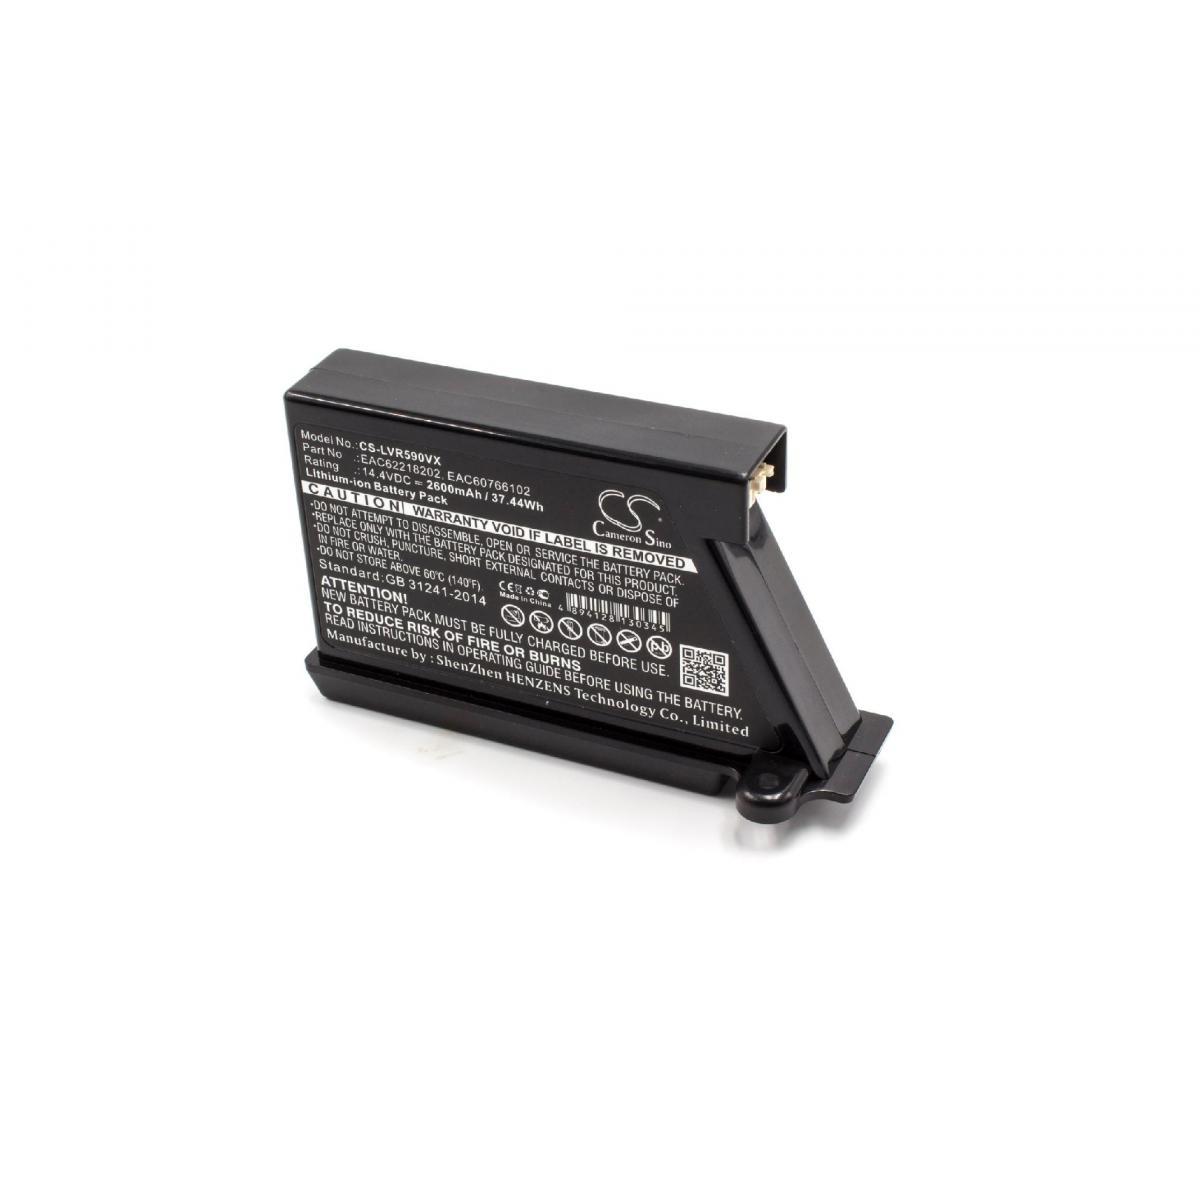 Vhbw vhbw Batterie compatible avec LG HOM-BOT VR6560LV, VR65704LVM, VR6570LVM robot électroménager (2600mAh, 14,4V, Li-ion)